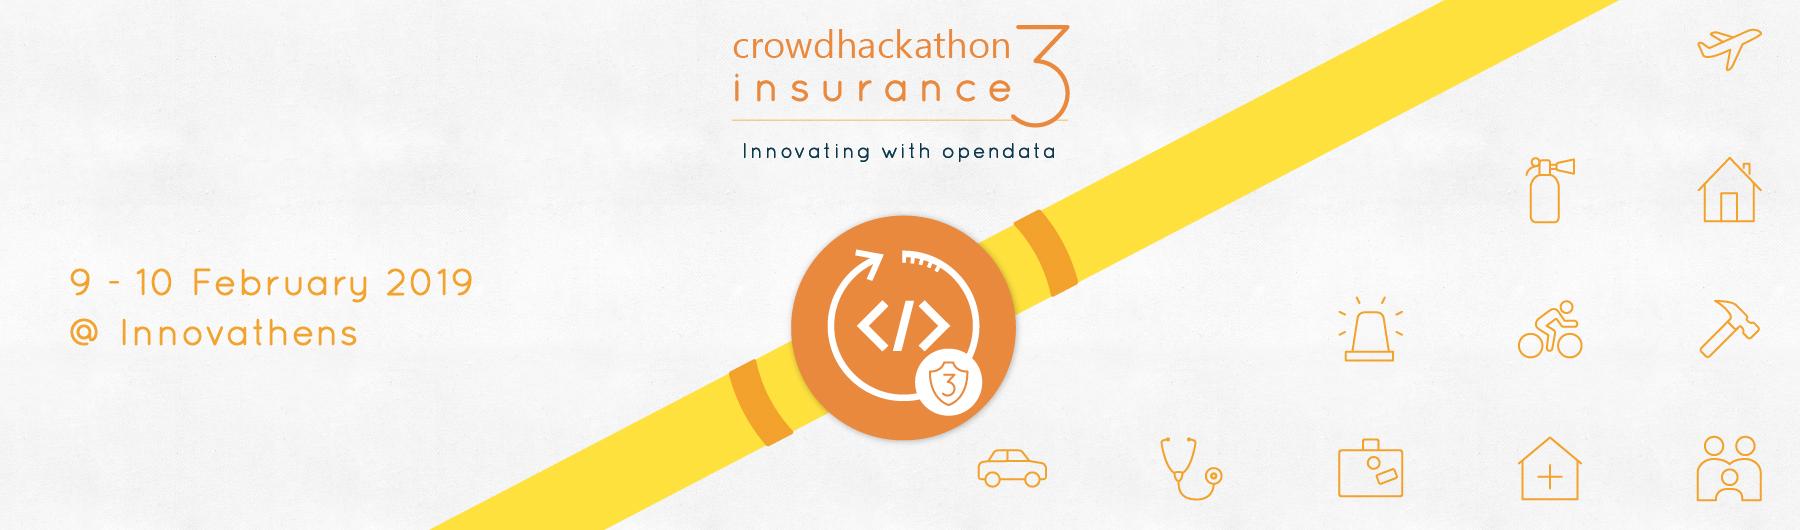 Crowdhackathon Insurance 3